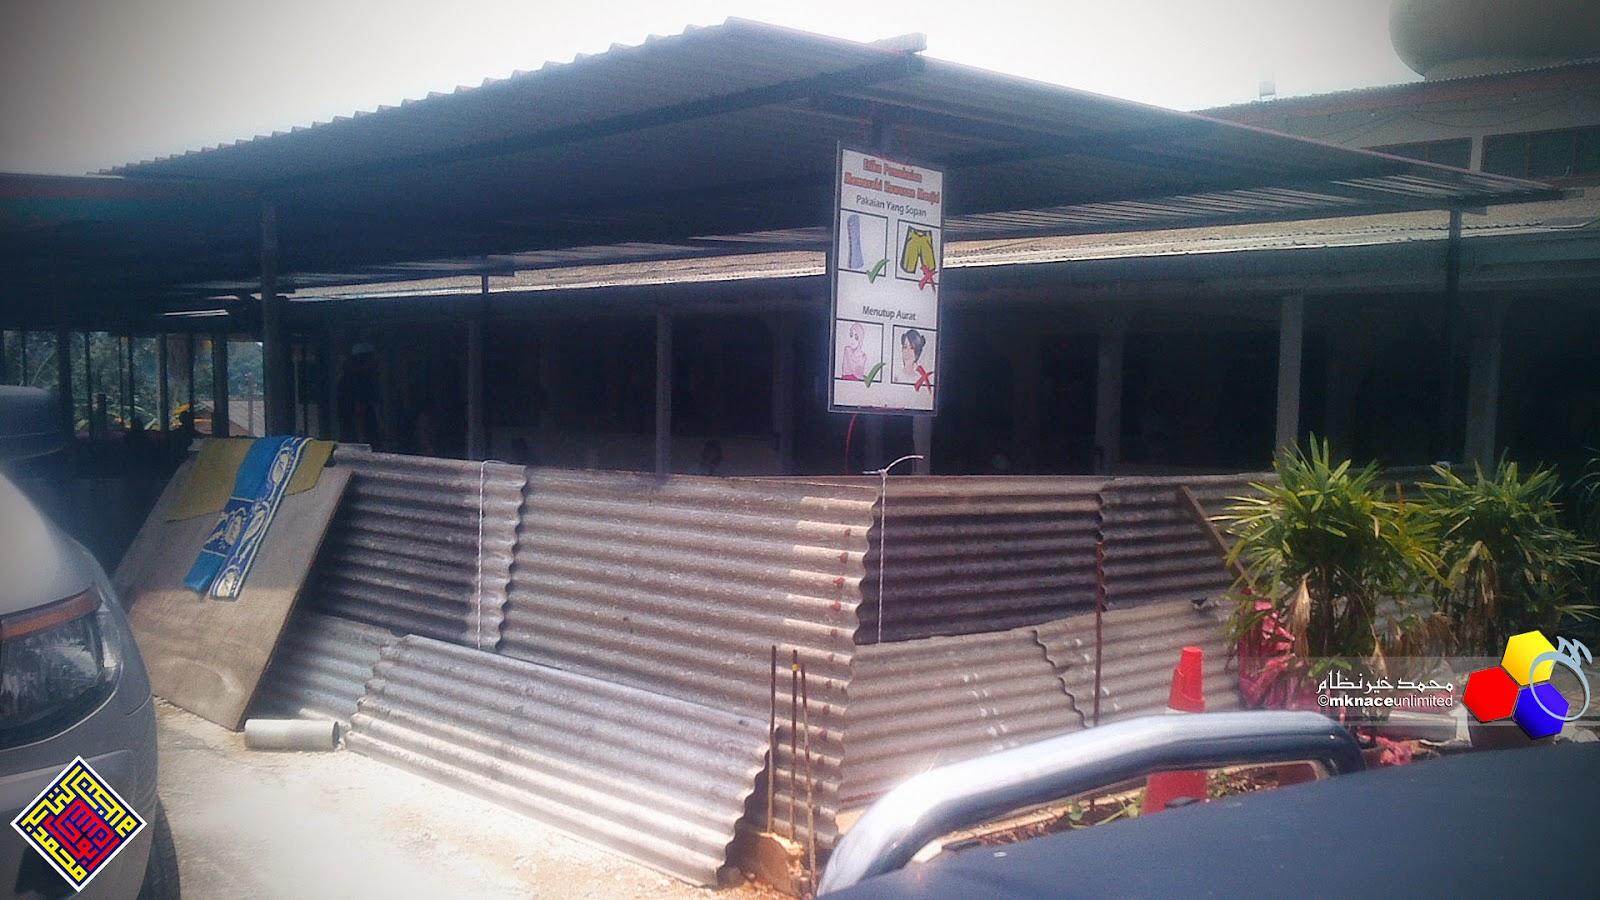 Masjid Jamek Gelang Patah renovasi 19 September 2014 updated